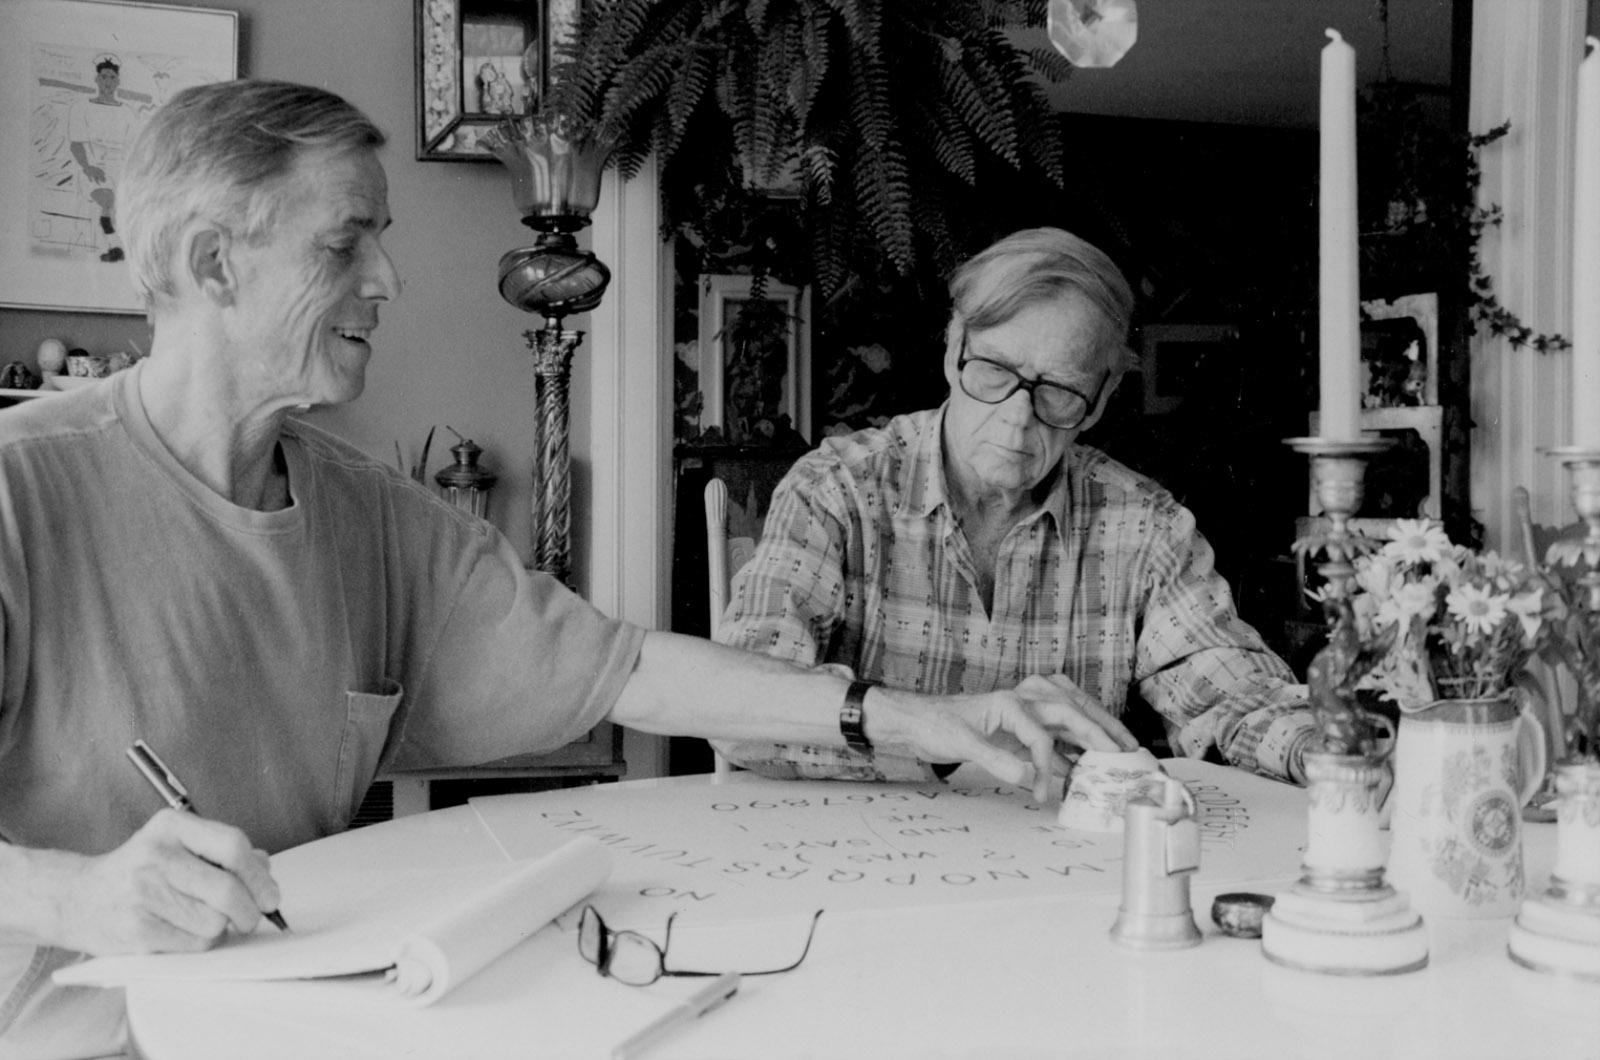 James Merrill and David Jackson at the Ouija board, Stonington, Connecticut, 1983